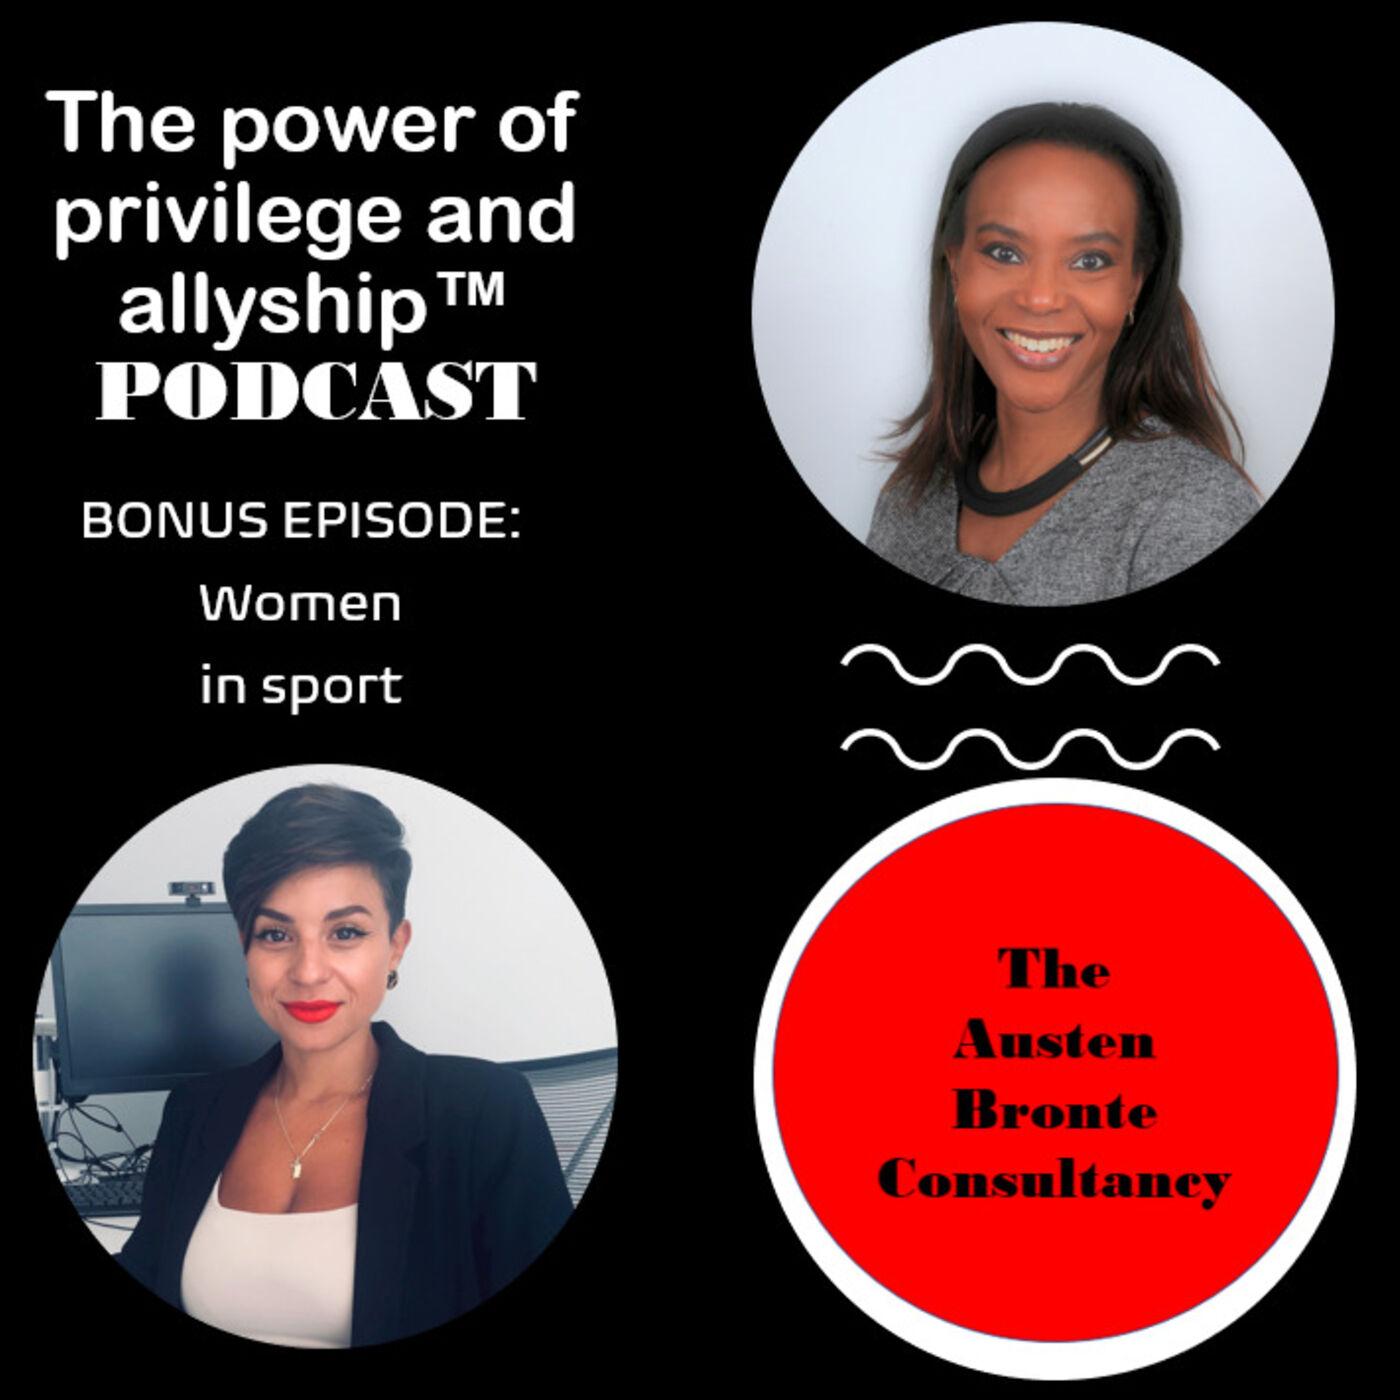 S1 BONUS EPISODE: Women in sport feat. Stefania Genesis